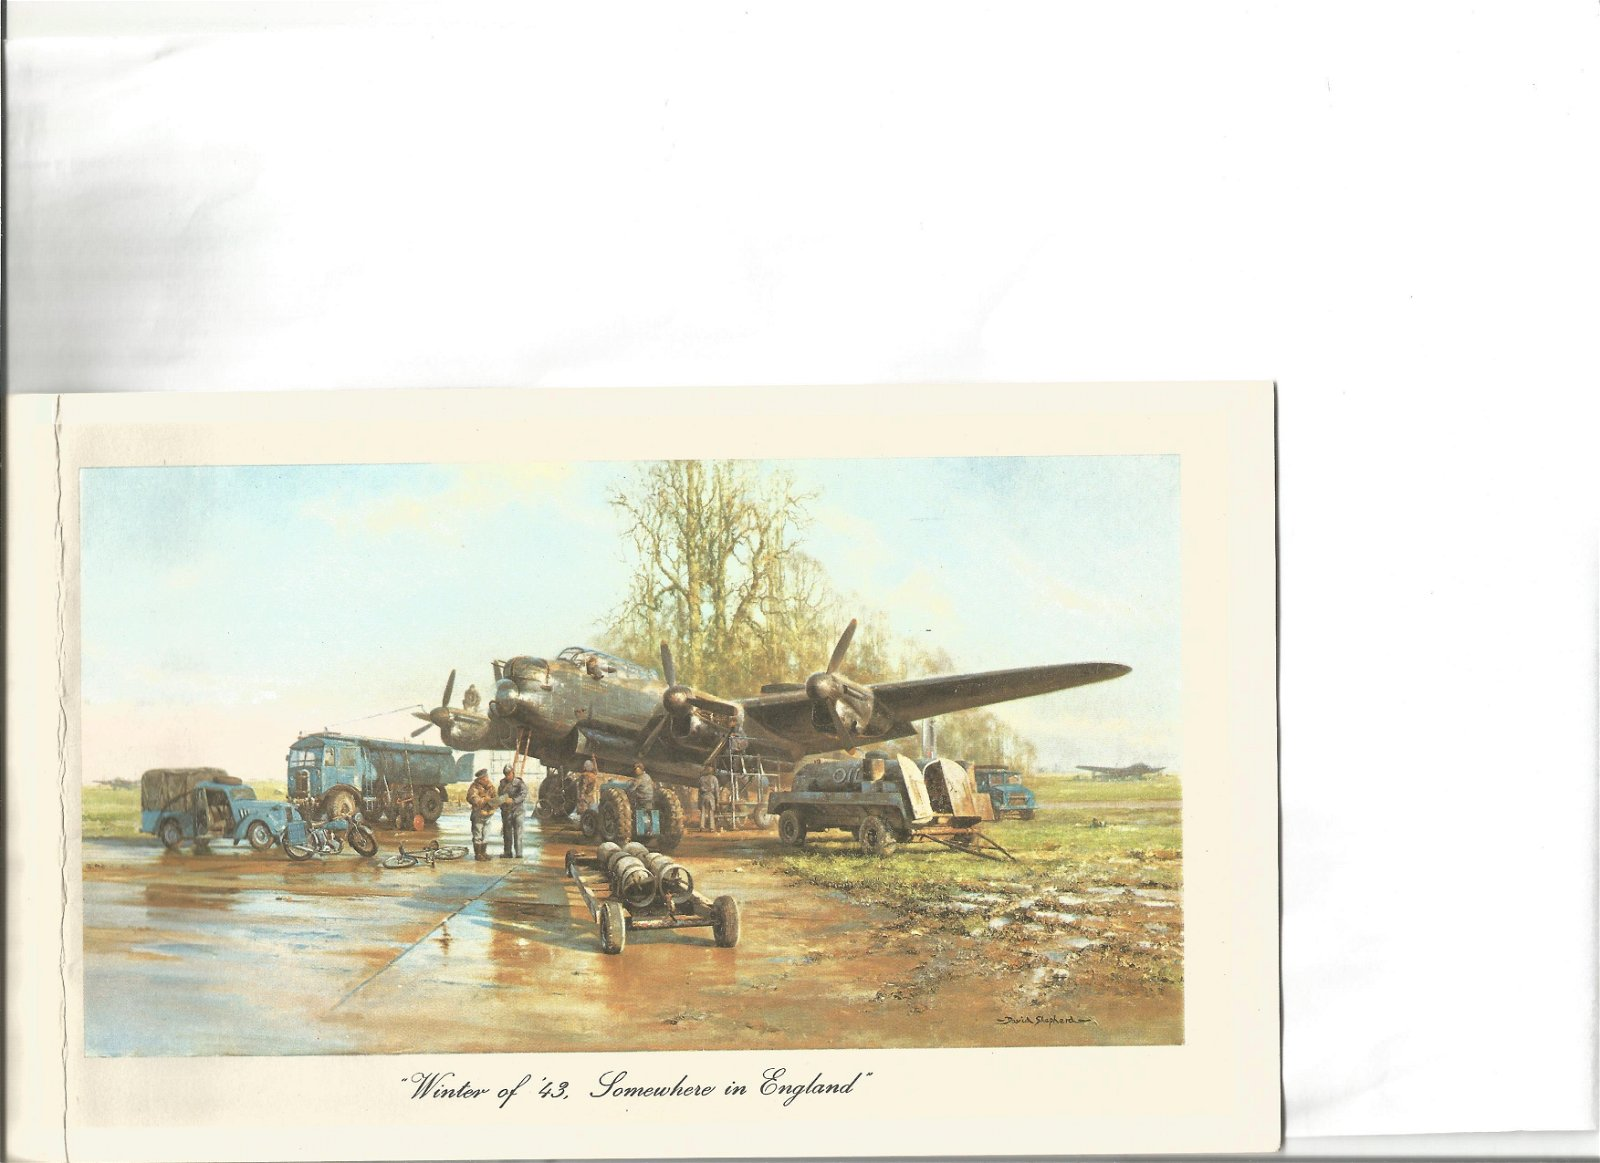 WW2 ace Denis Crowley Milling DFC artist David Shepherd